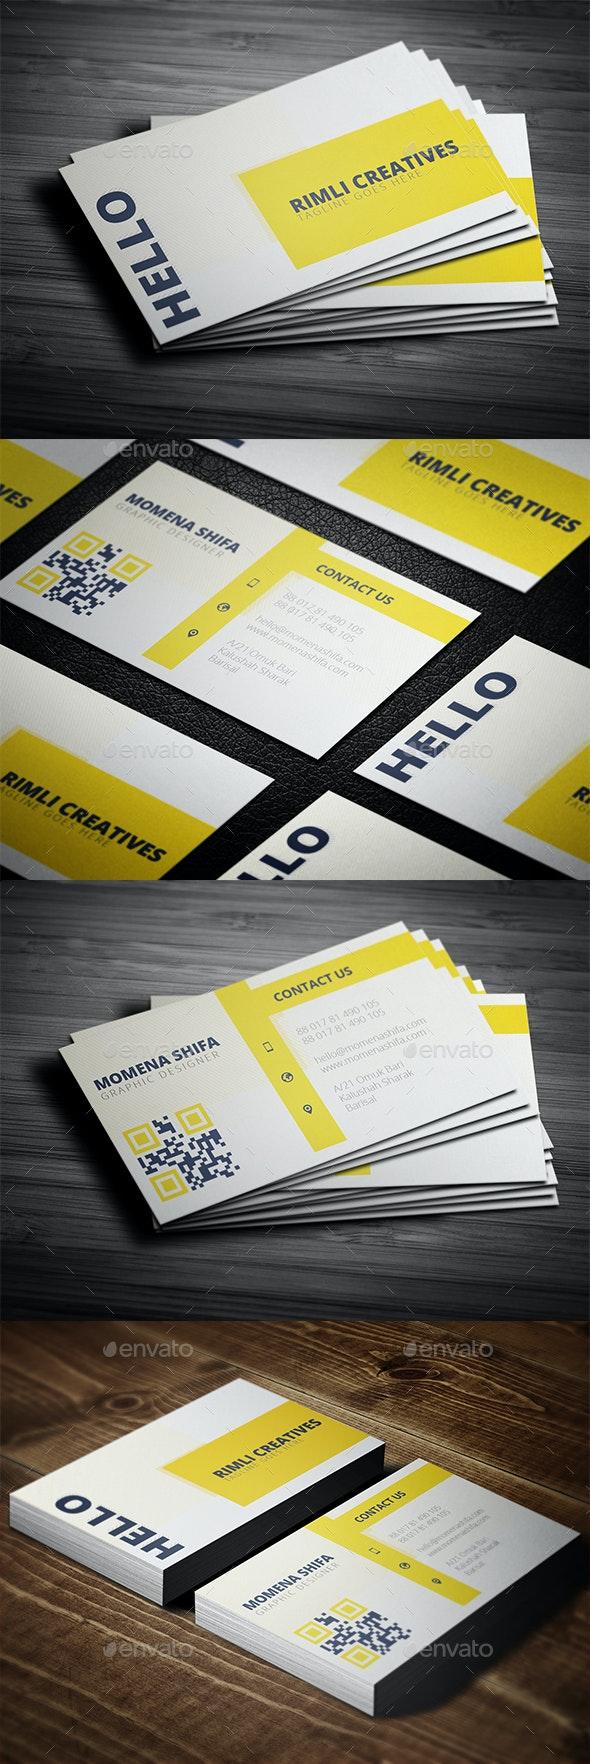 Sleek Business Card Design - Creative Business Cards